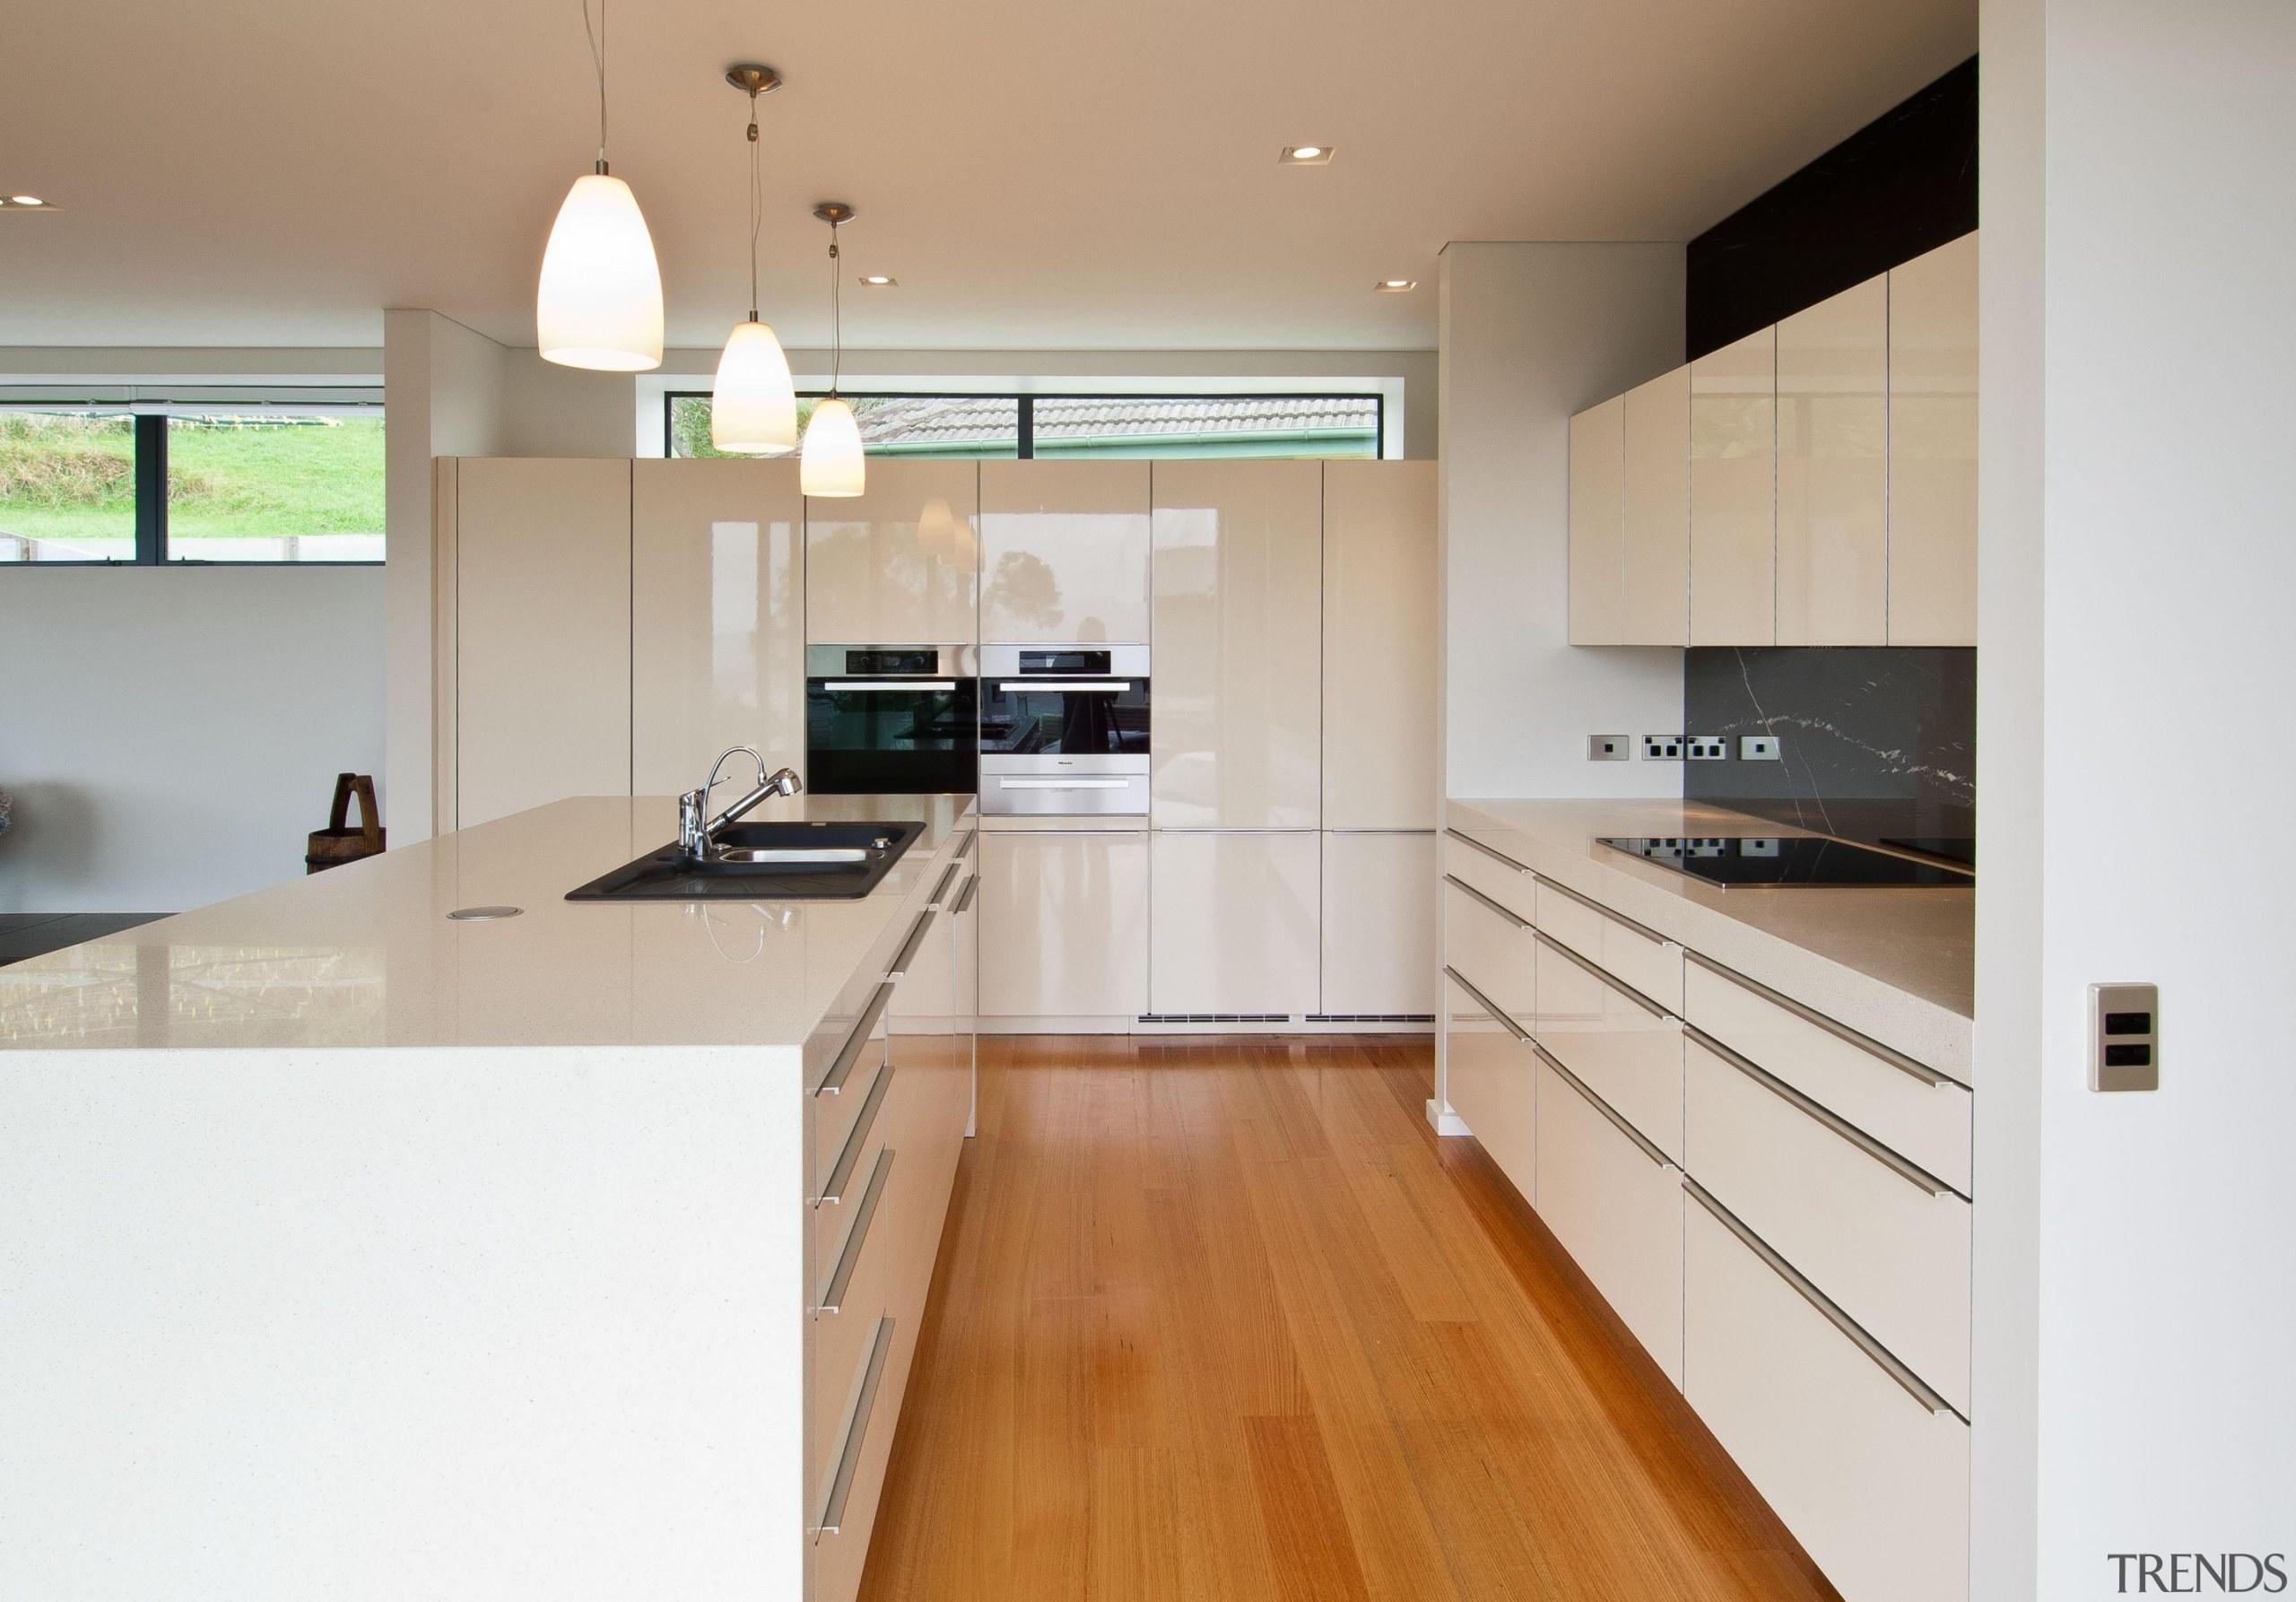 Khandallah Kitchen - Khandallah Kitchen - cabinetry | cabinetry, countertop, cuisine classique, floor, flooring, hardwood, interior design, kitchen, real estate, room, wood flooring, gray